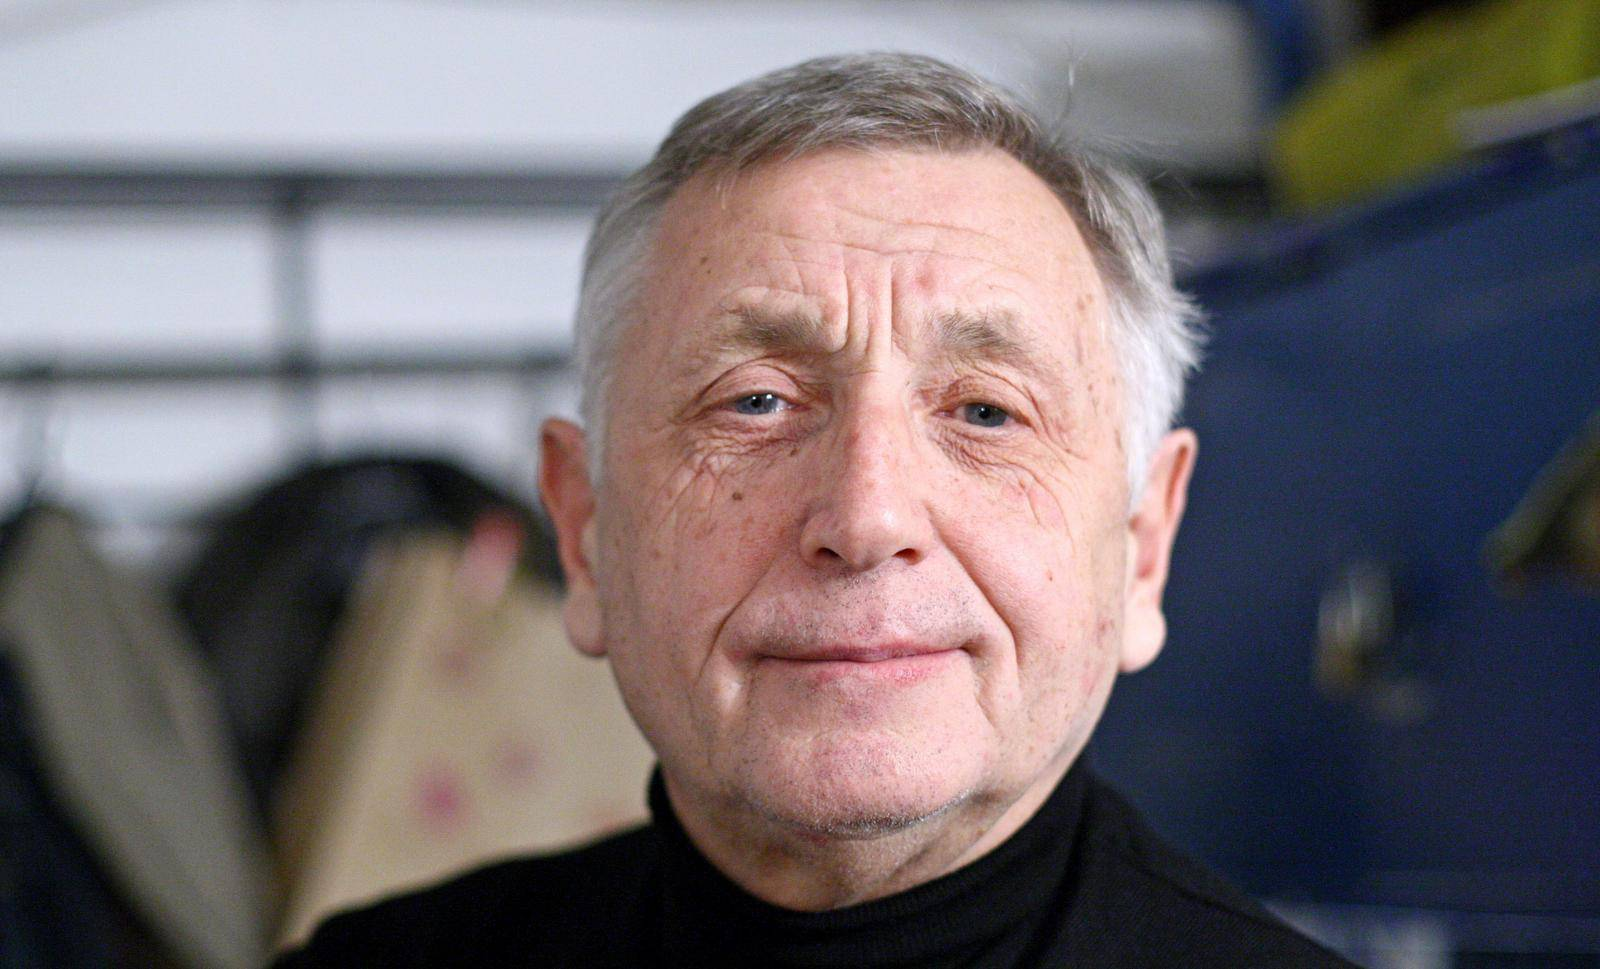 Preminuo je proslavljeni češki redatelj i oskarovac Jiří Menzel